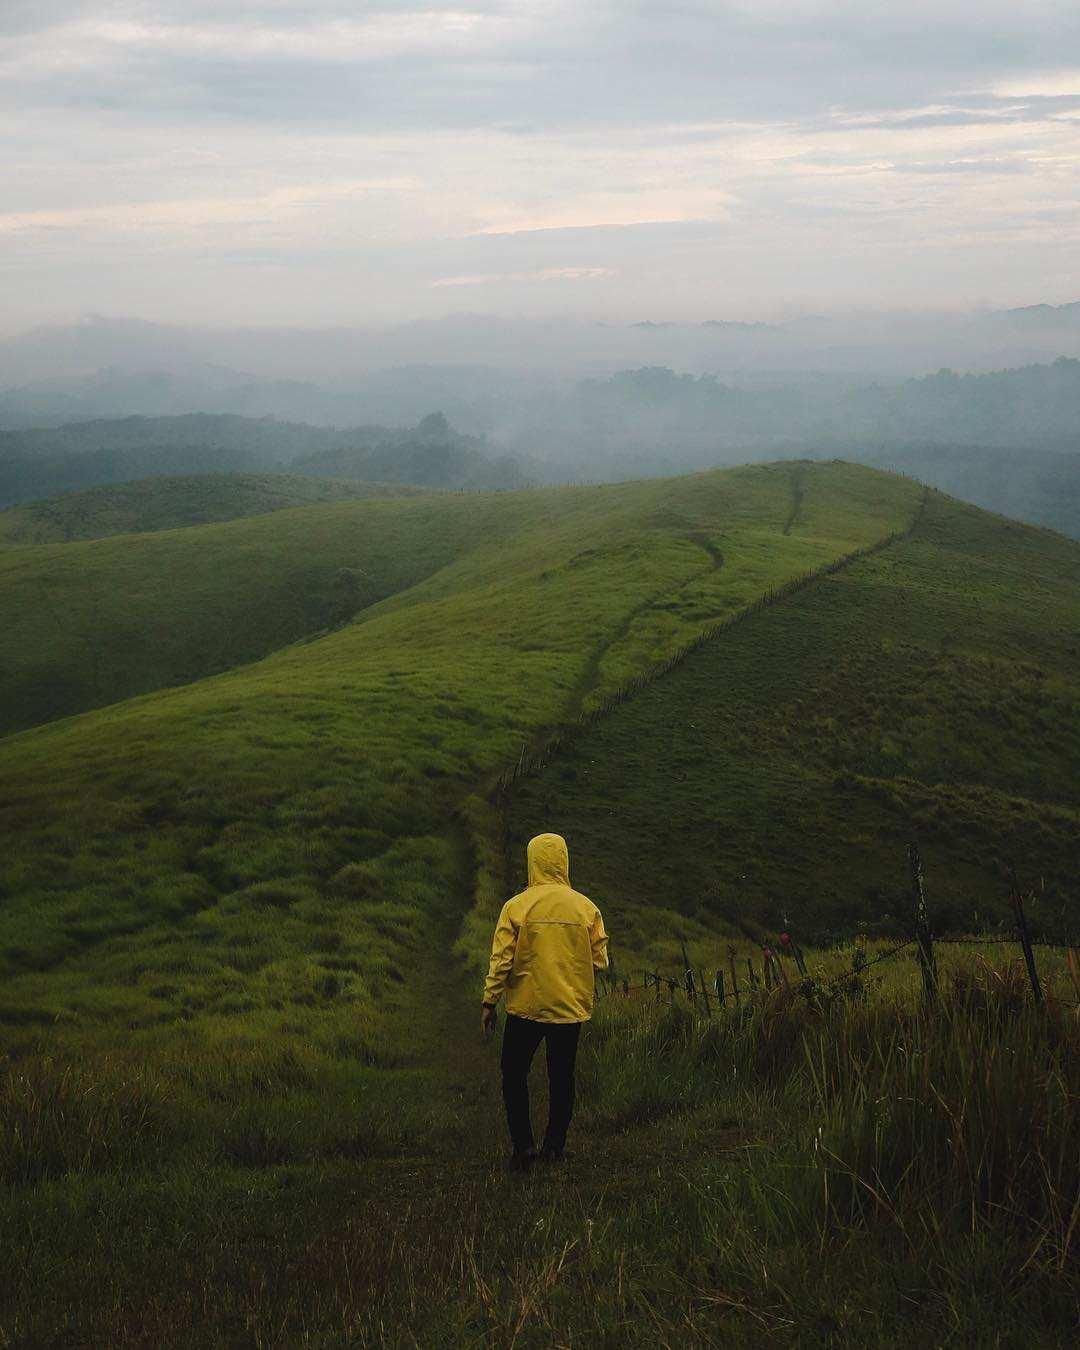 Bukit Rimpi Image From @baratdaya